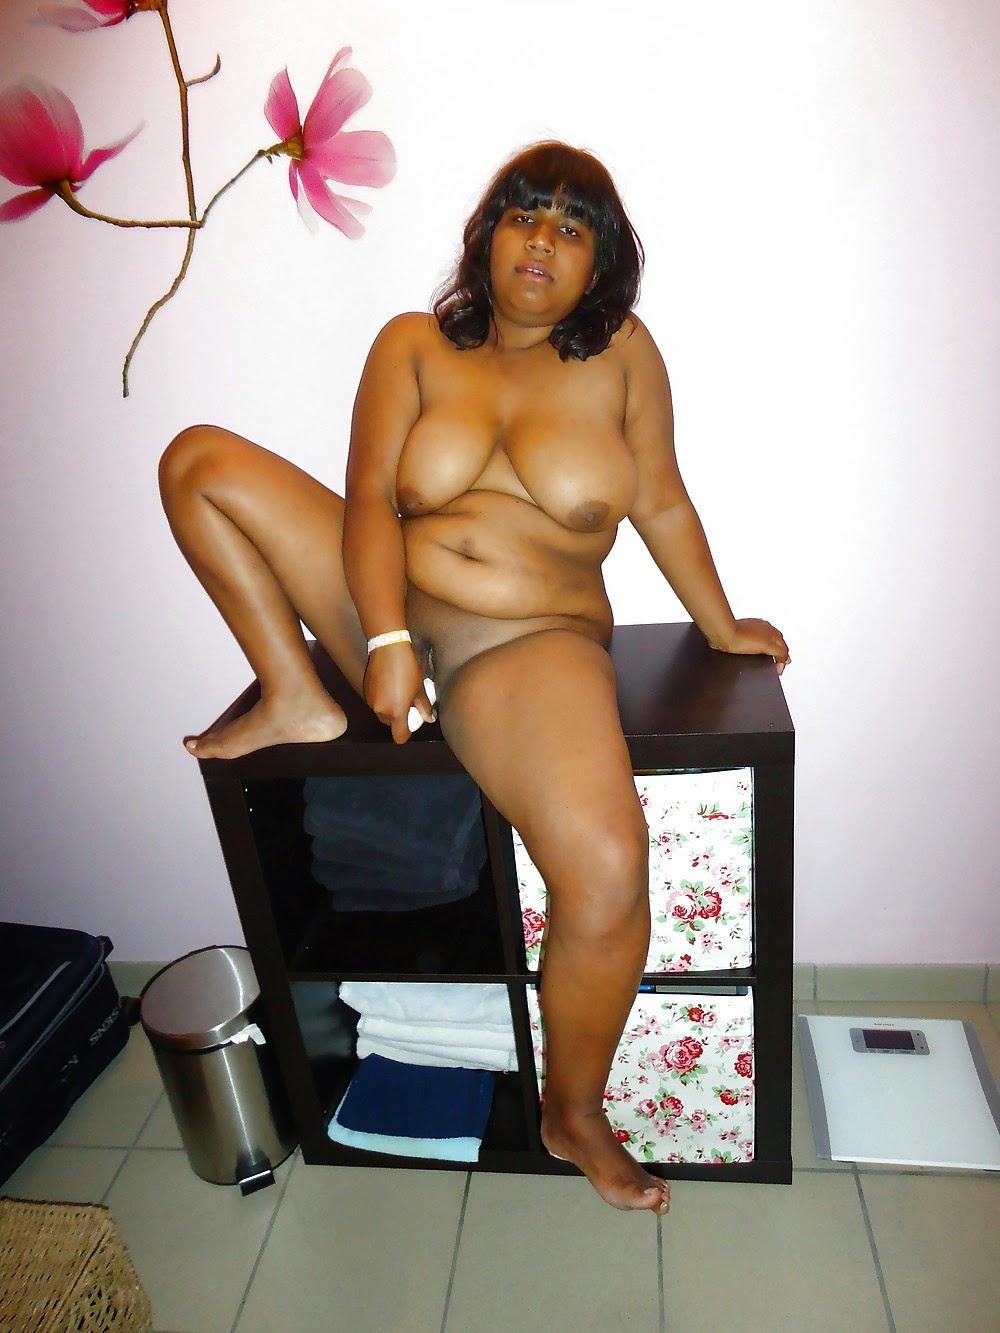 Big boobs busty naked bhabhi South Indian sexy BBW